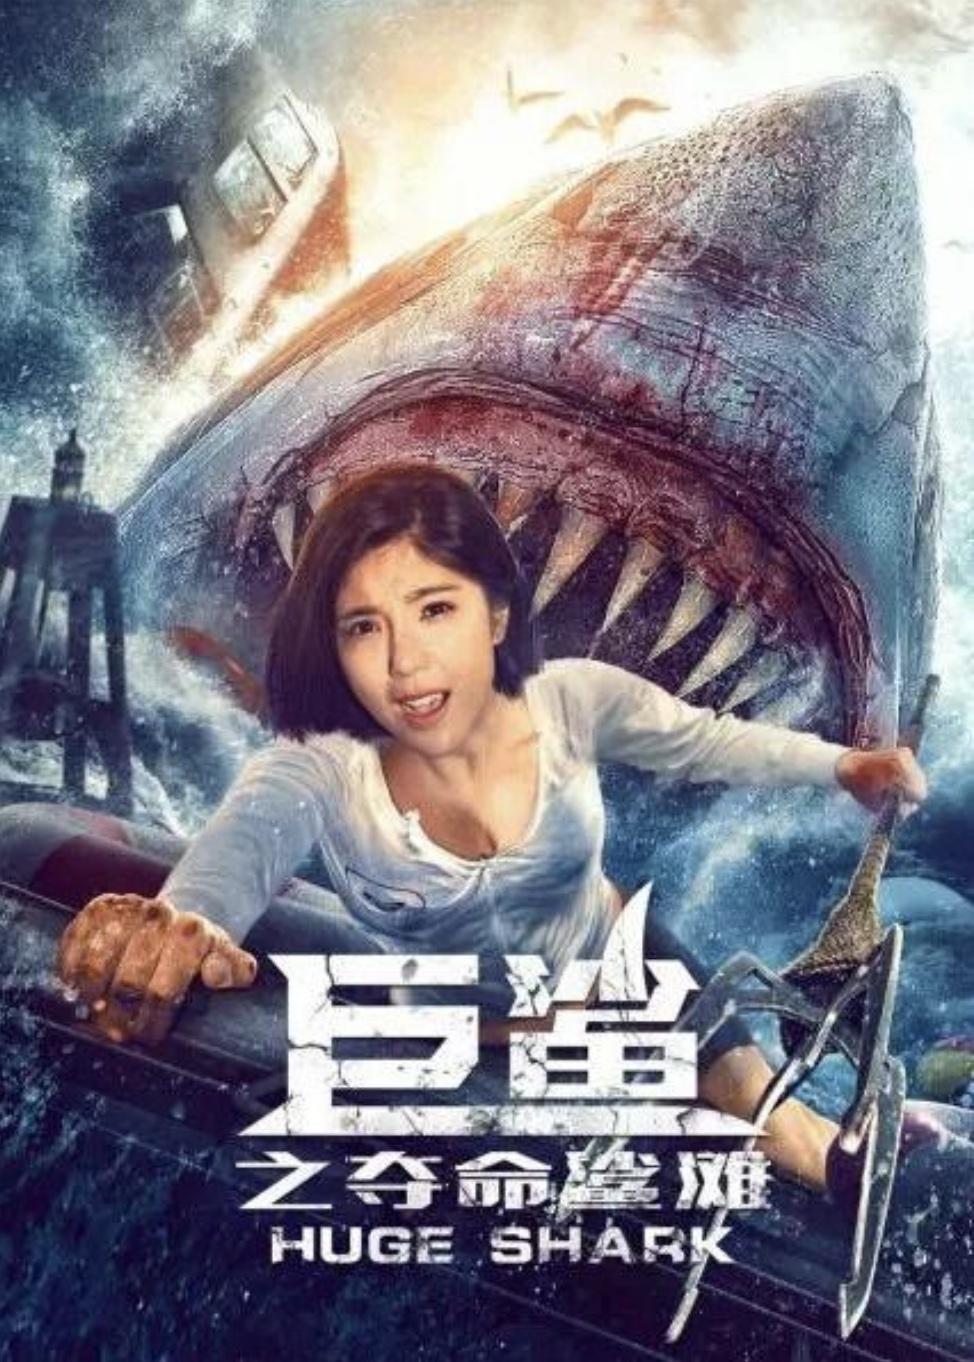 Huge Shark (2021)